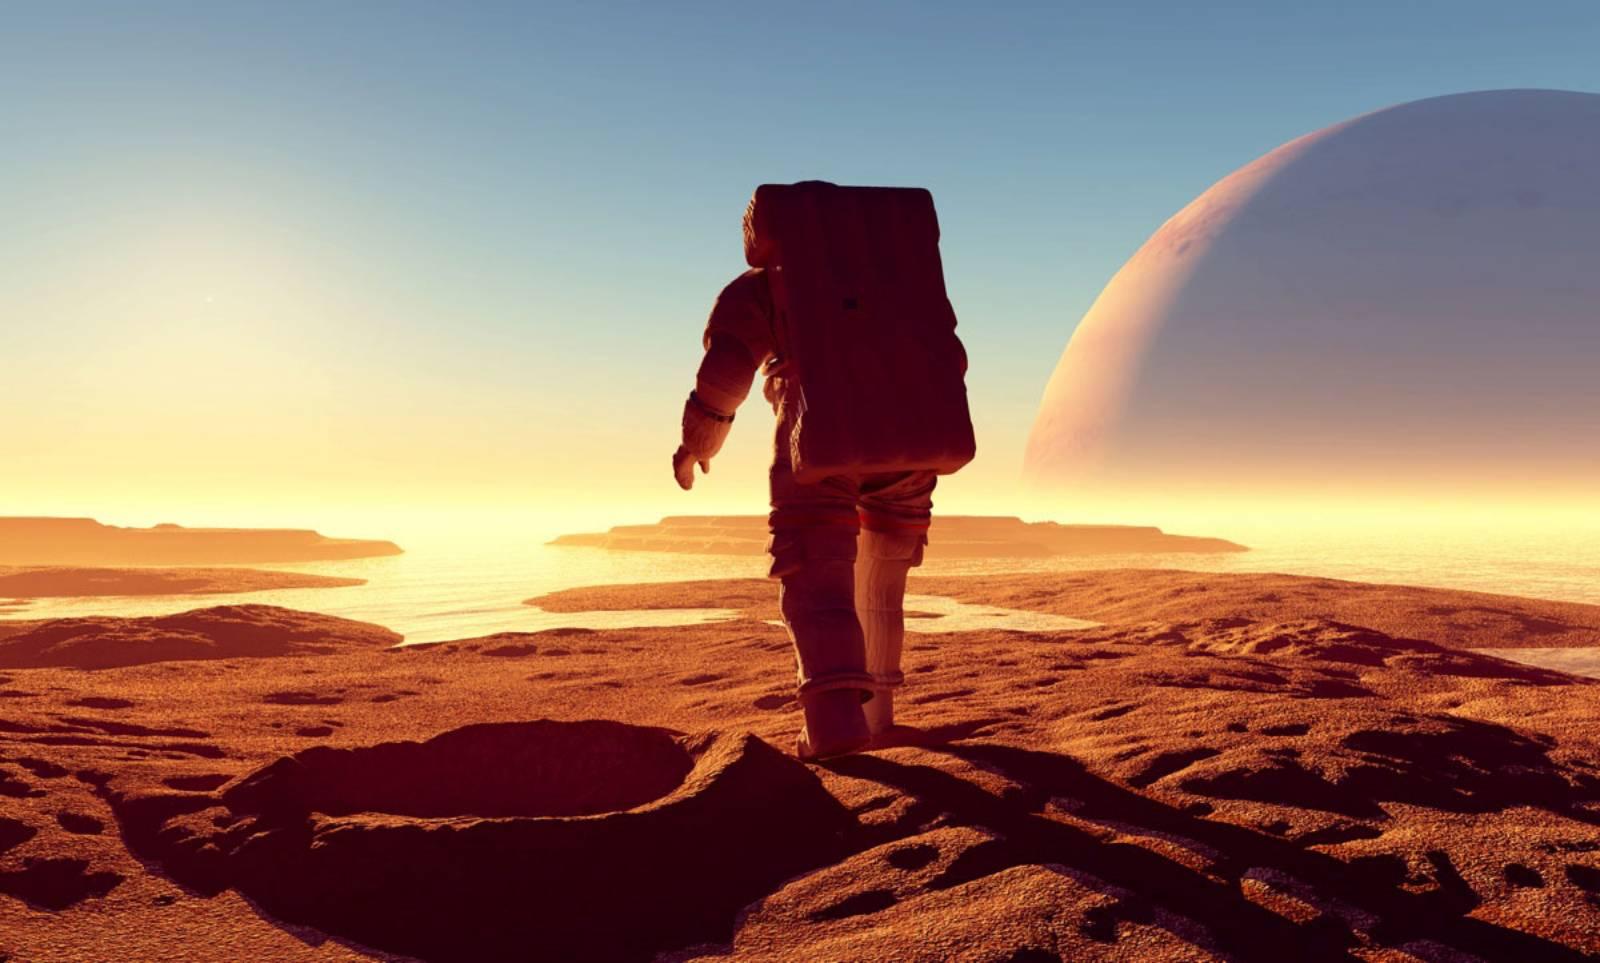 Planeta Marte NASA ESA Anunta Proiect INCREDIBIL pentru Omenire